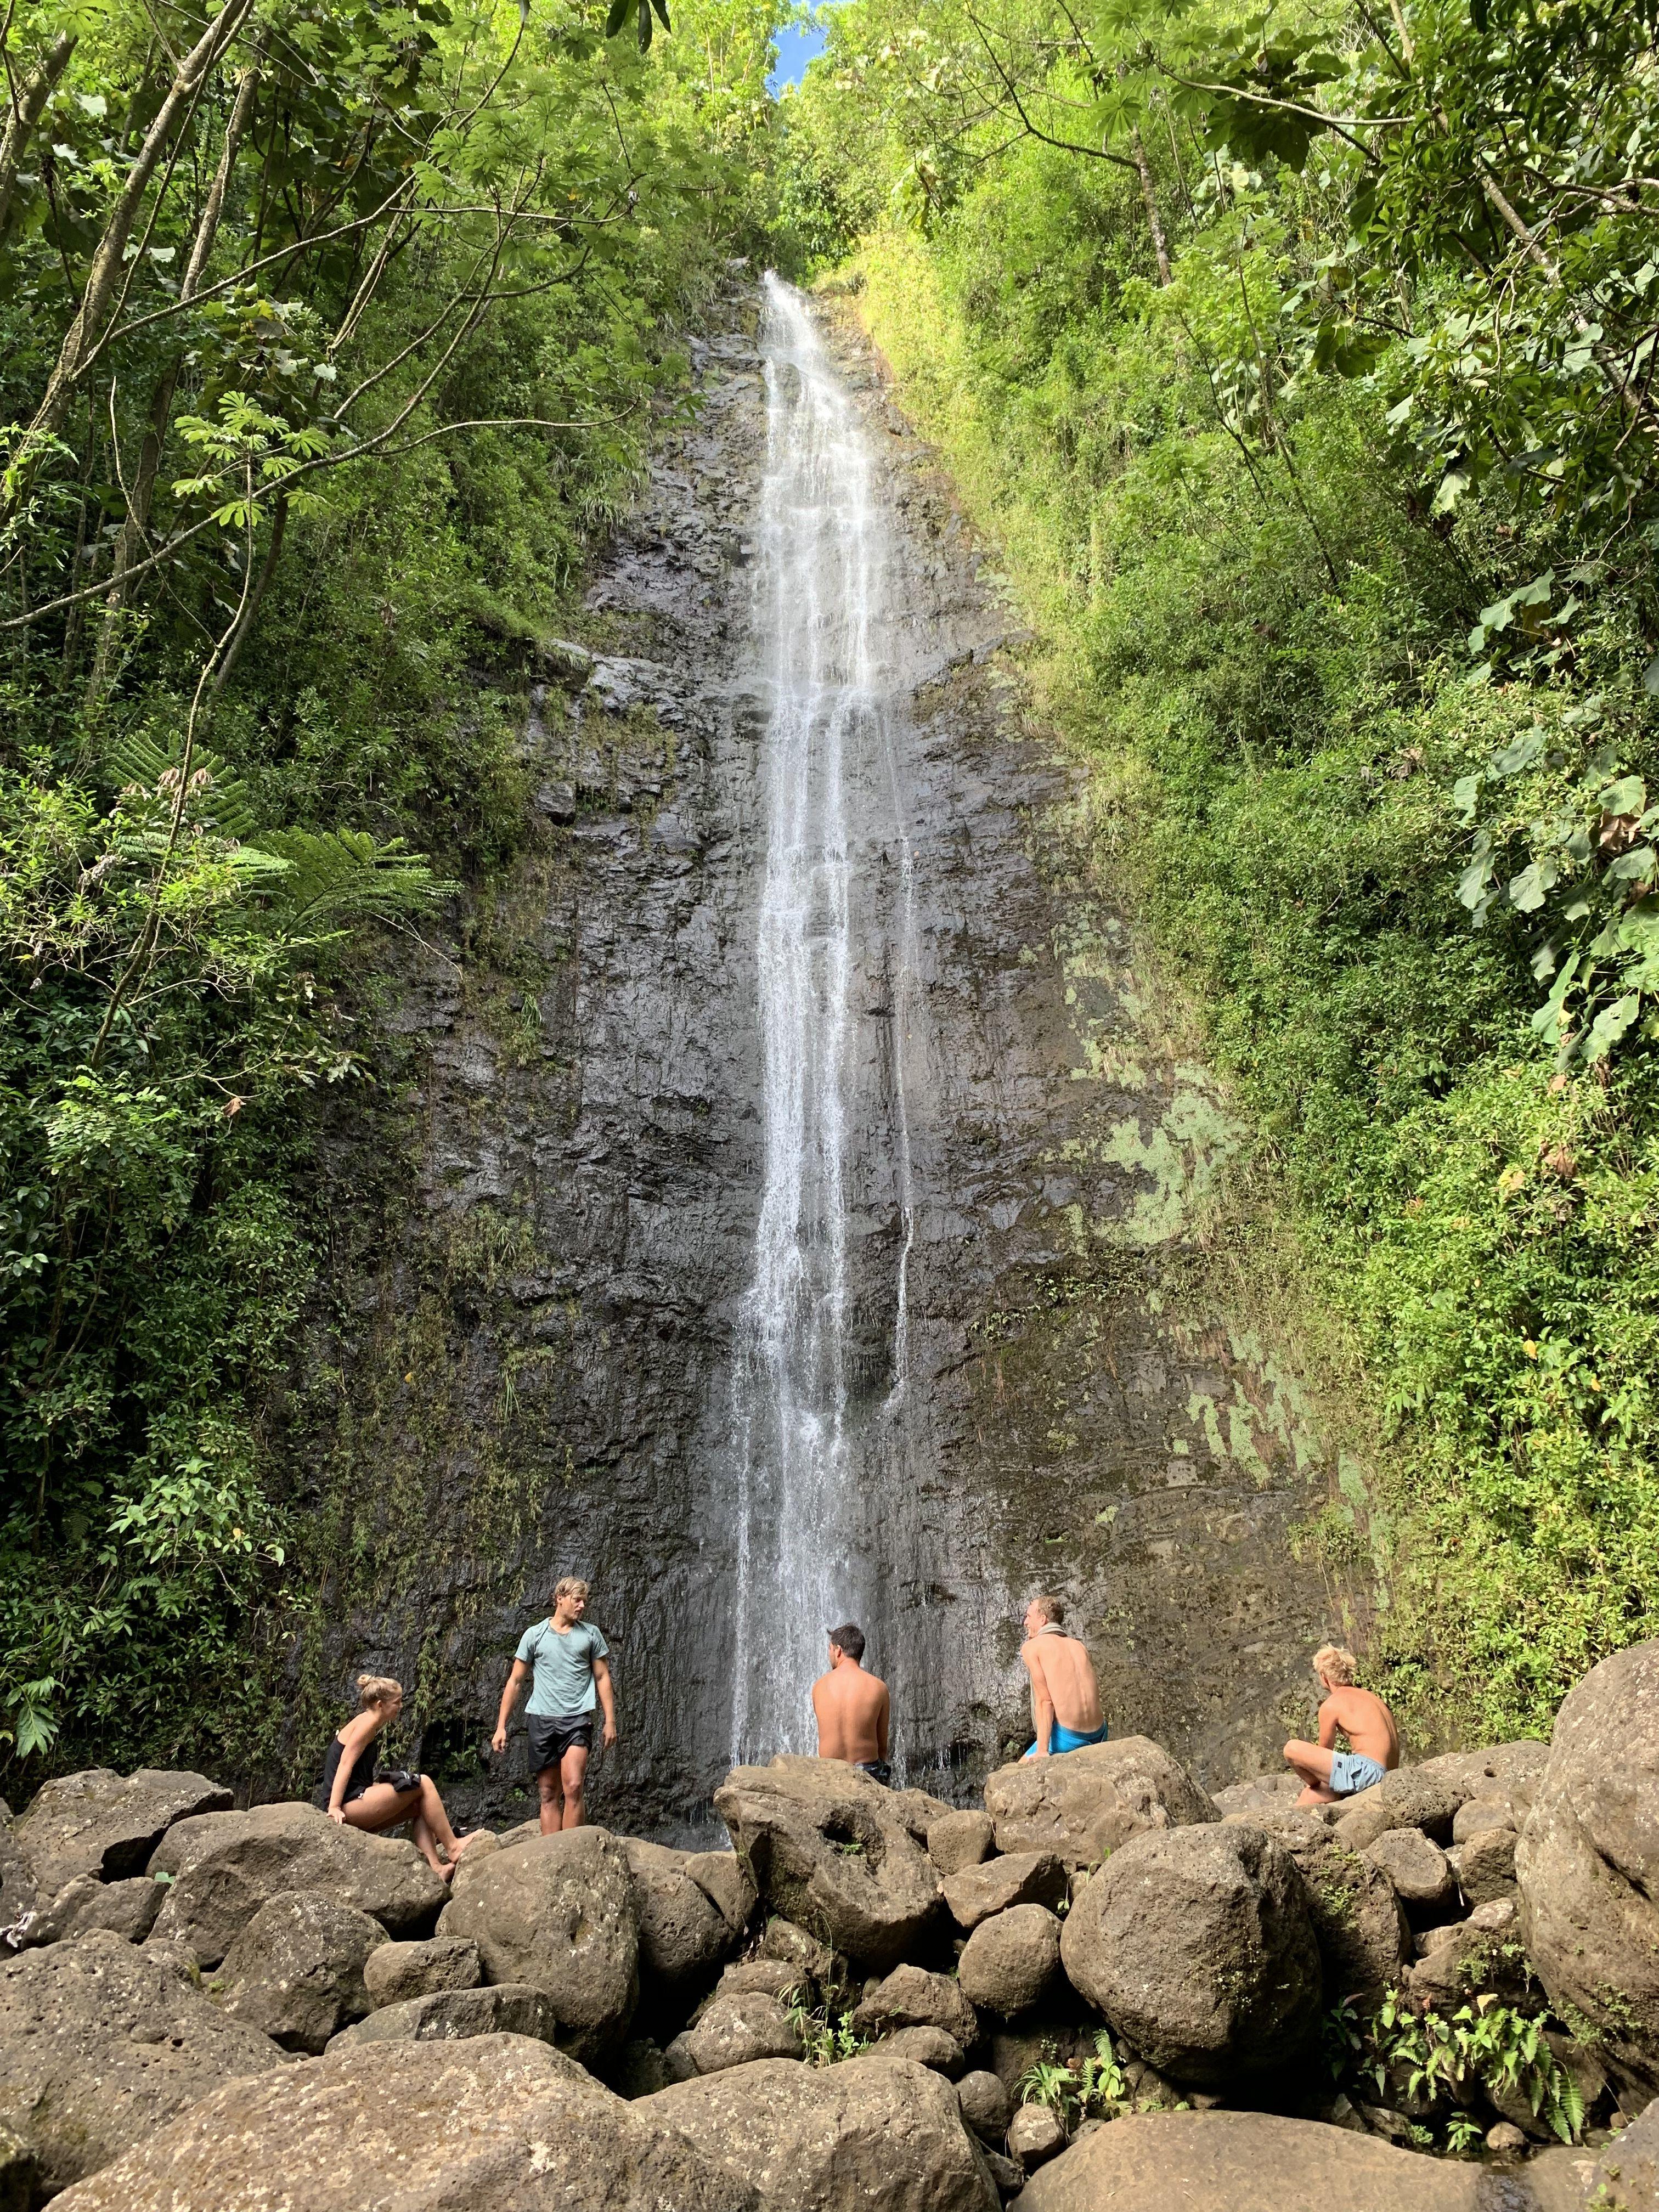 Jurassic Park Waterfall Manoa Falls Hike Adventure Waterfall Country Roads